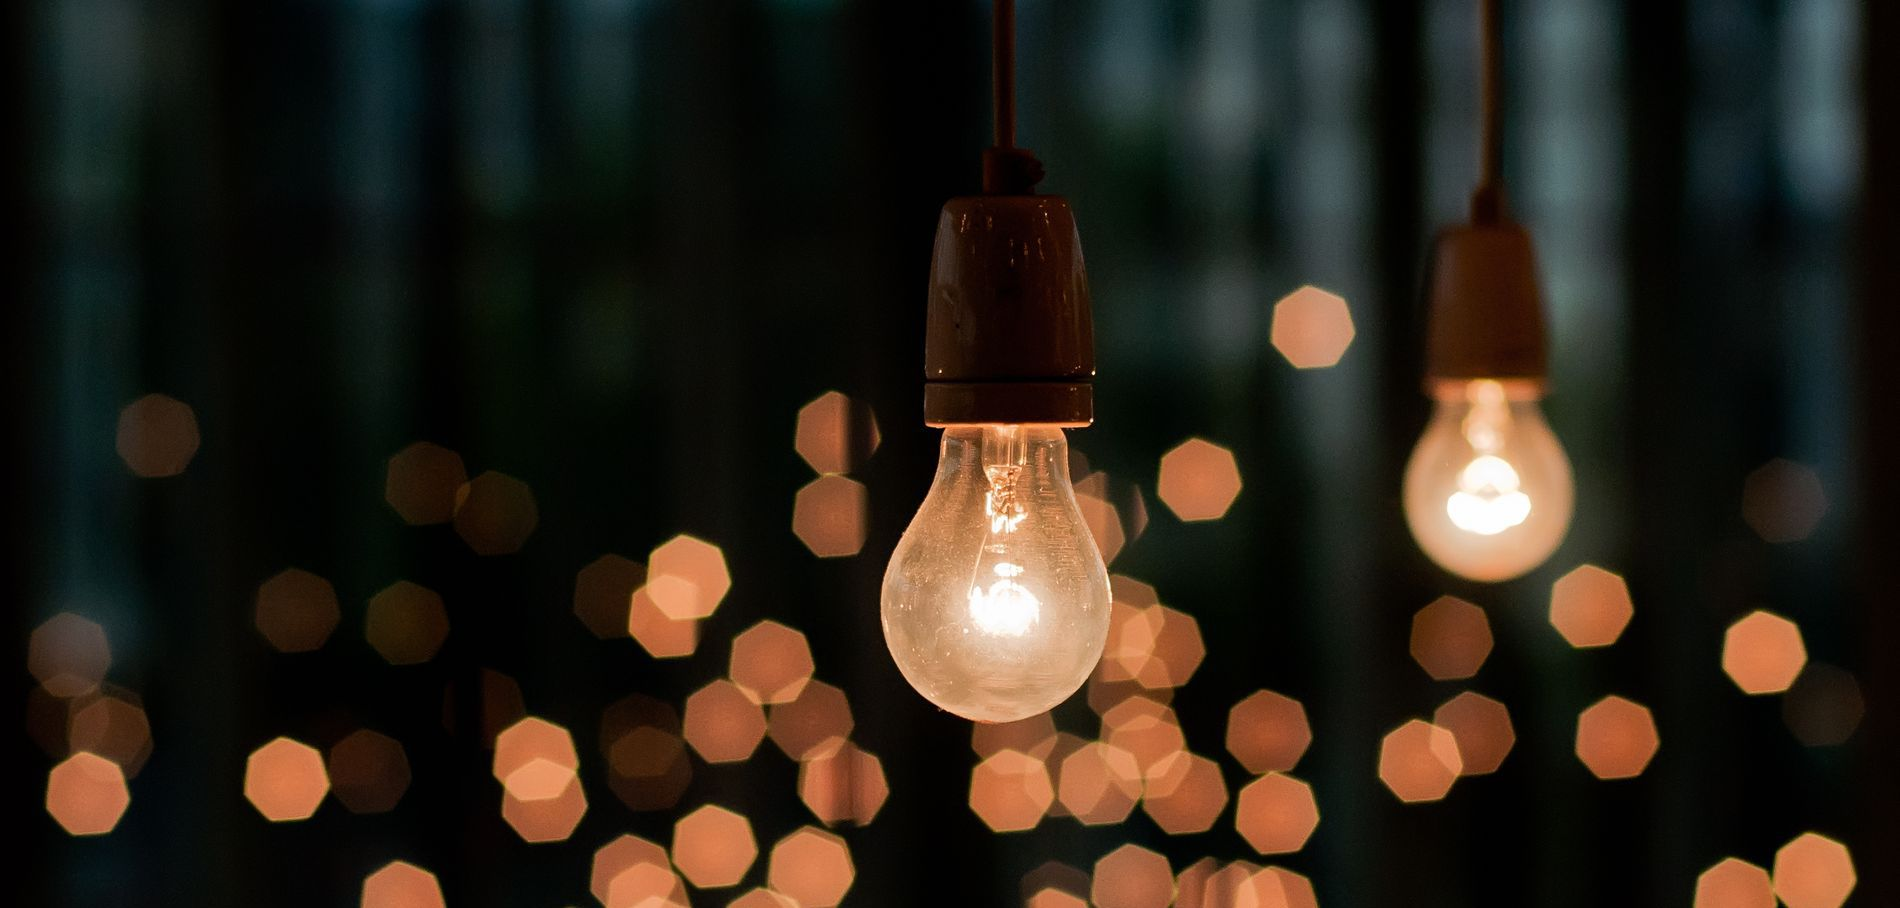 Eclairage nocturne des luminaires